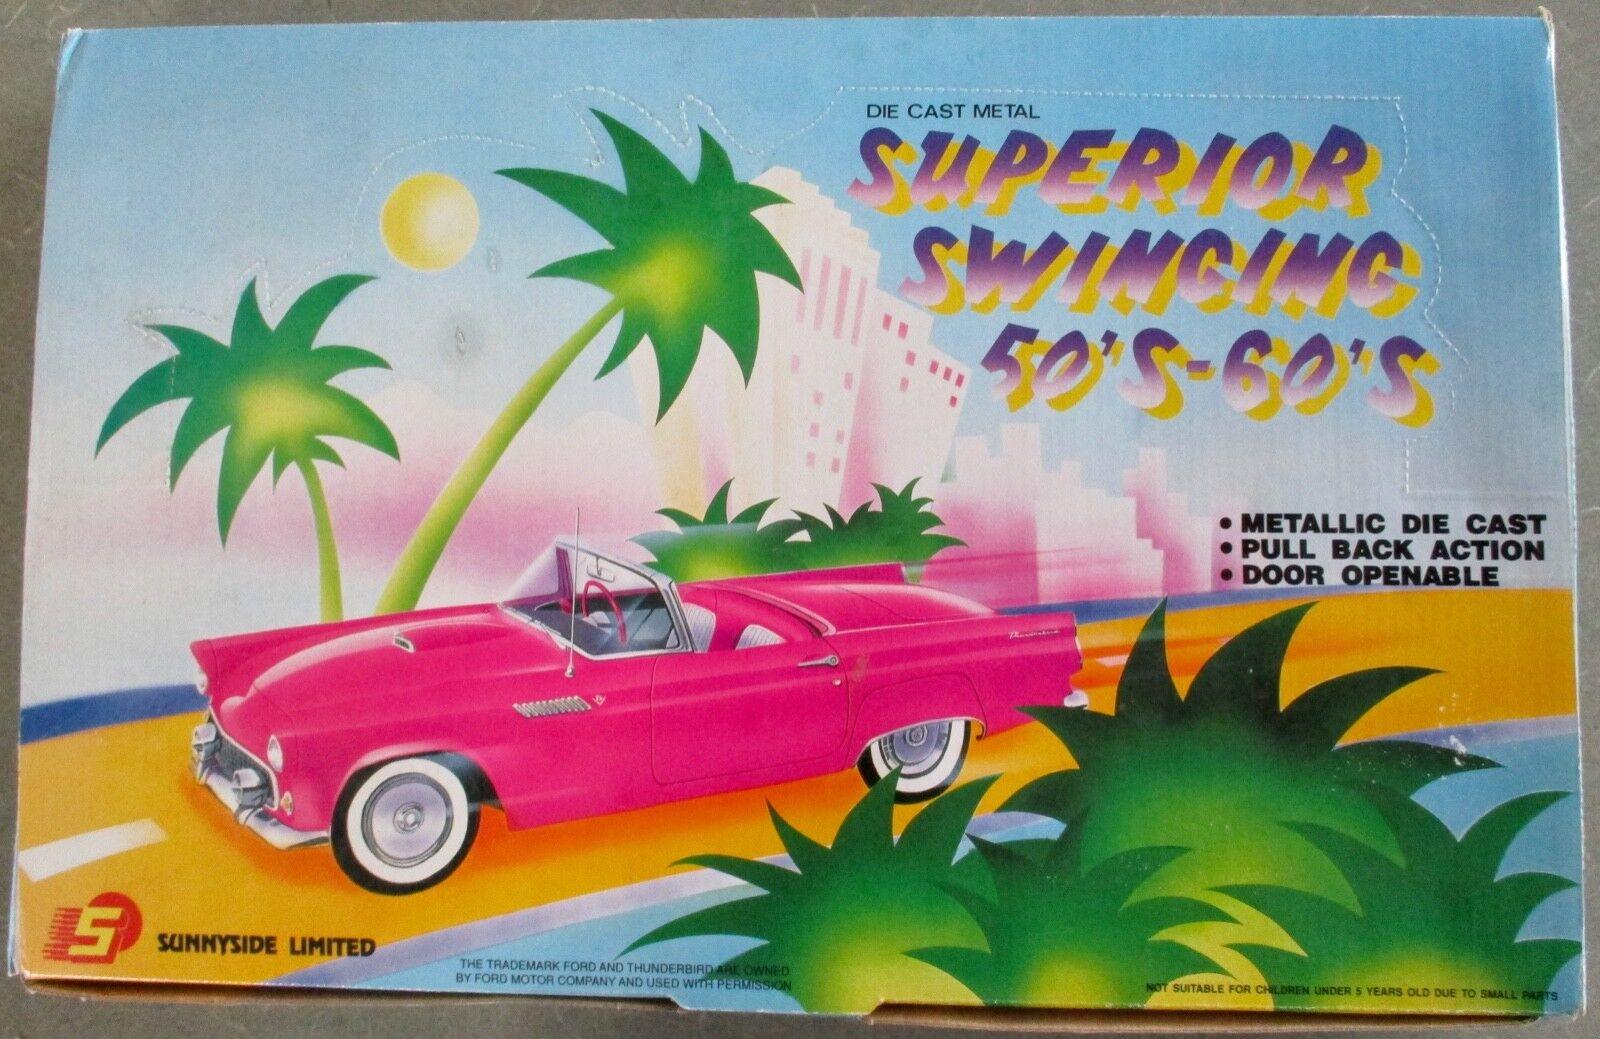 Sunnyside Ltd 12 Superior Swinging 50's-60's die cast metal cars